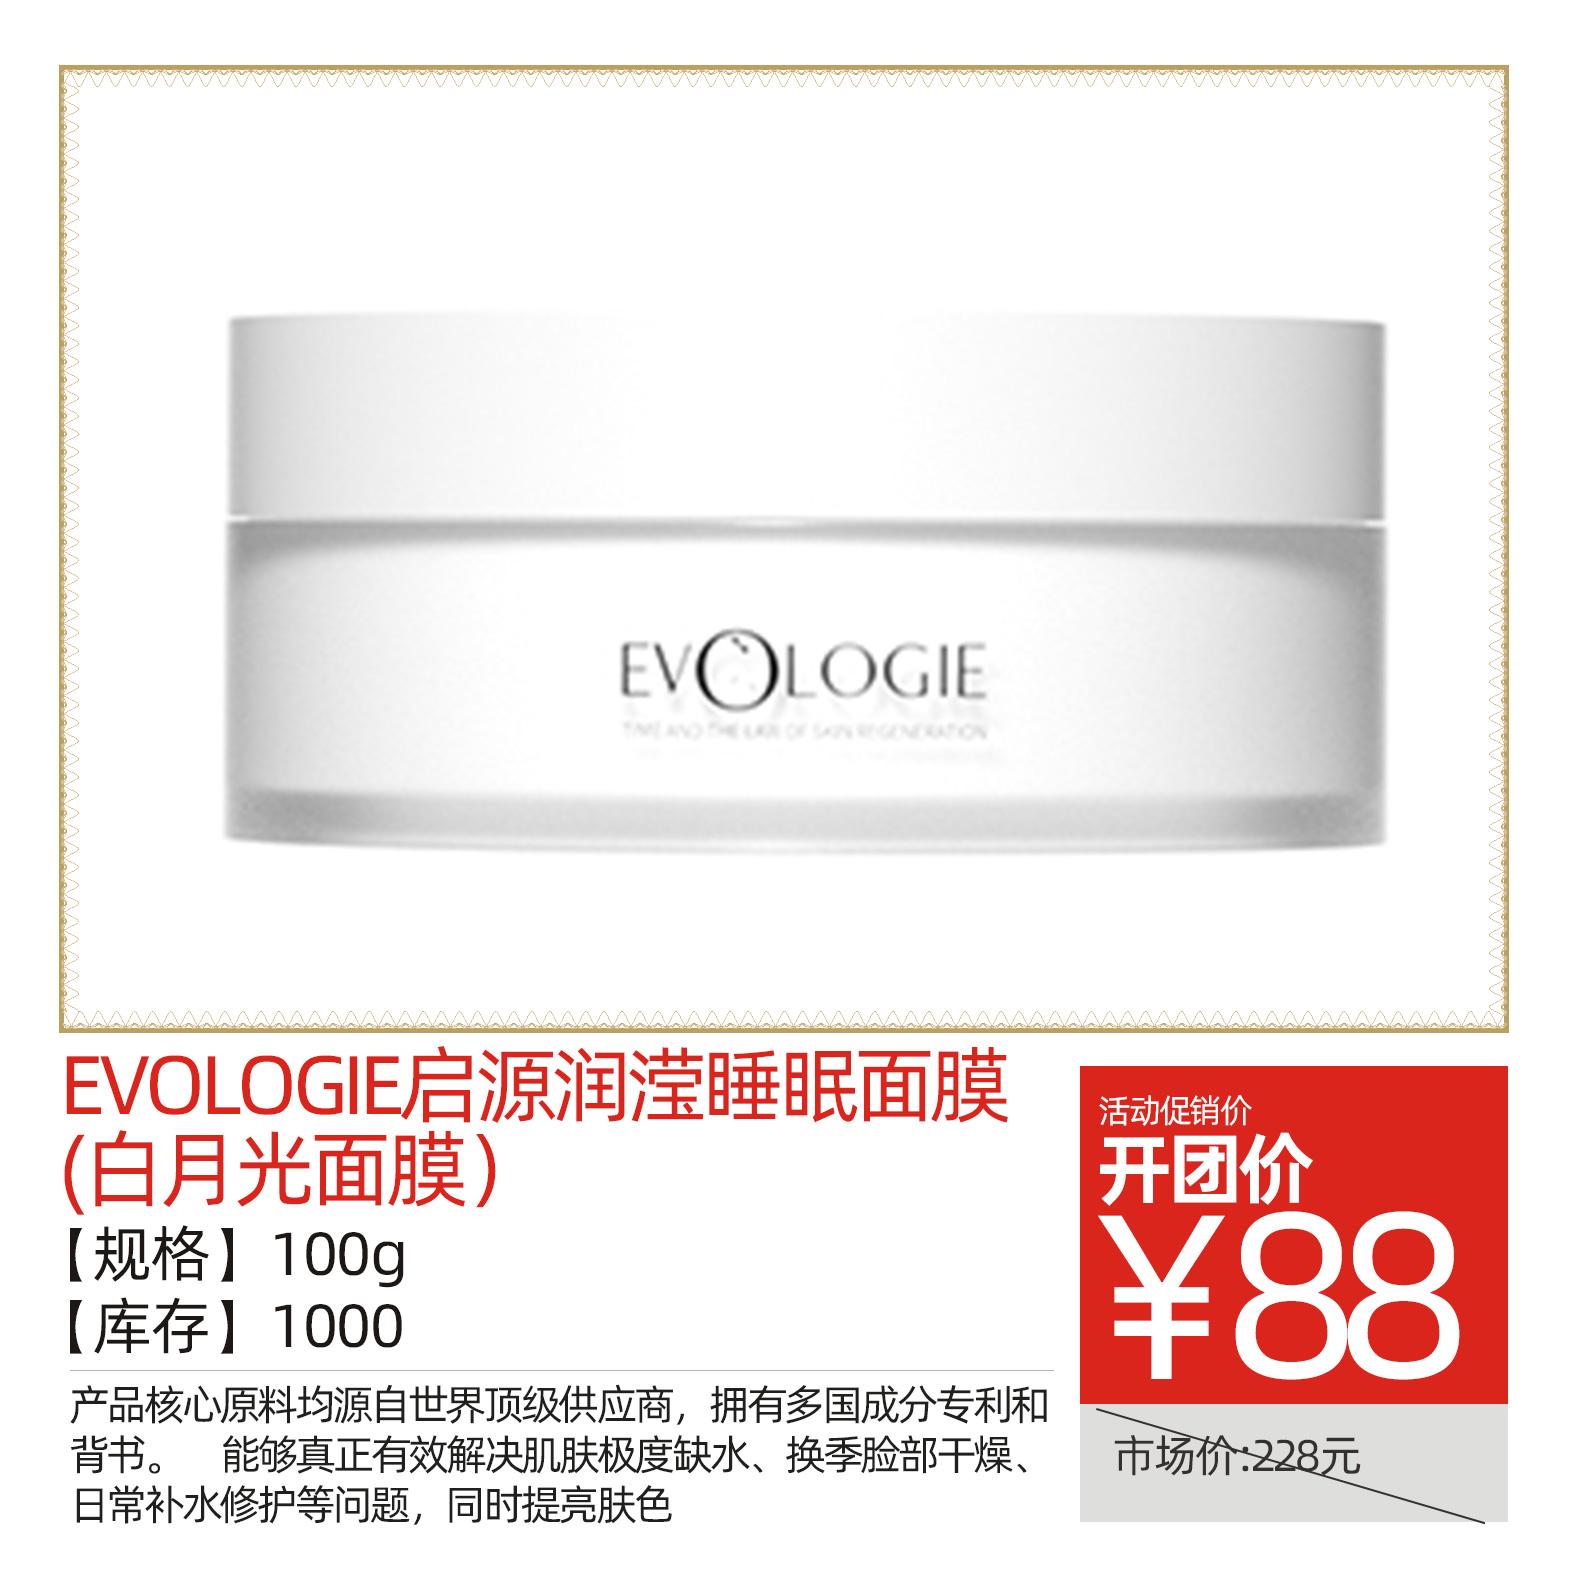 Evologie启源润滢睡眠面膜(白月光面膜)